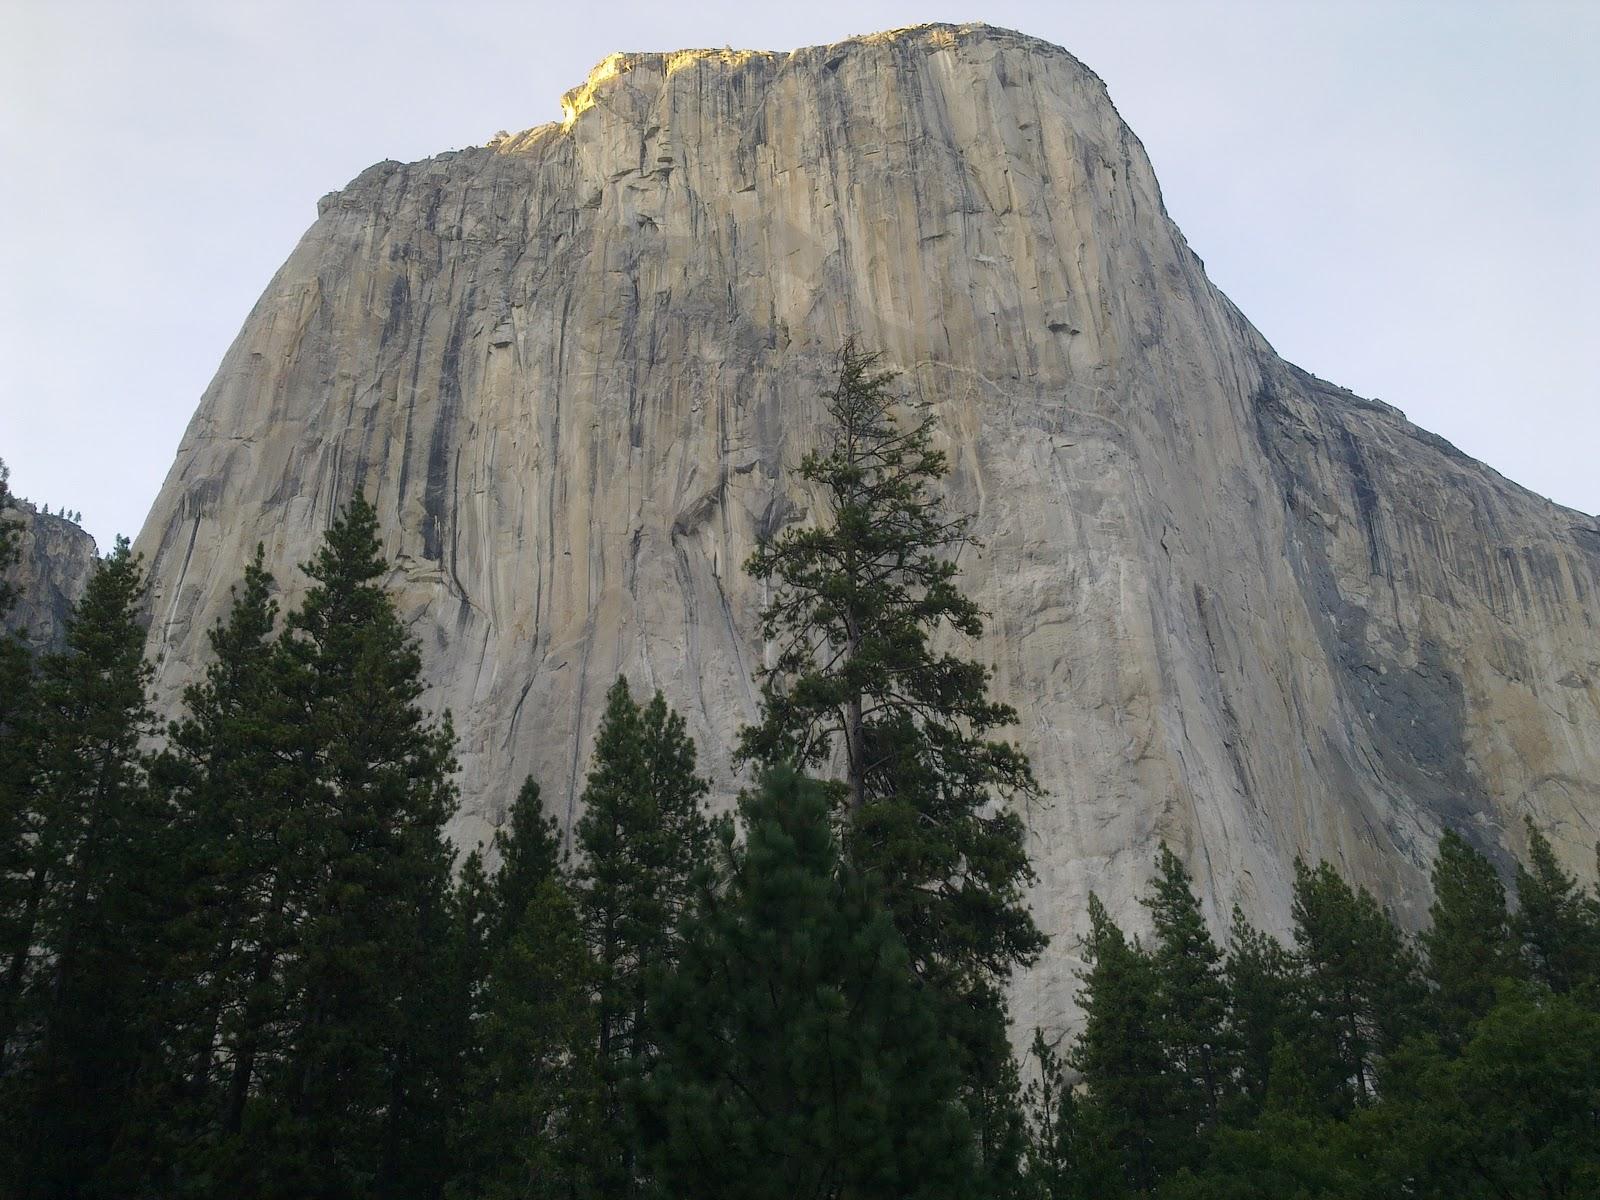 Cartina Yosemite National Park.Pronti Viaa 4 Giorno Yosemite National Park